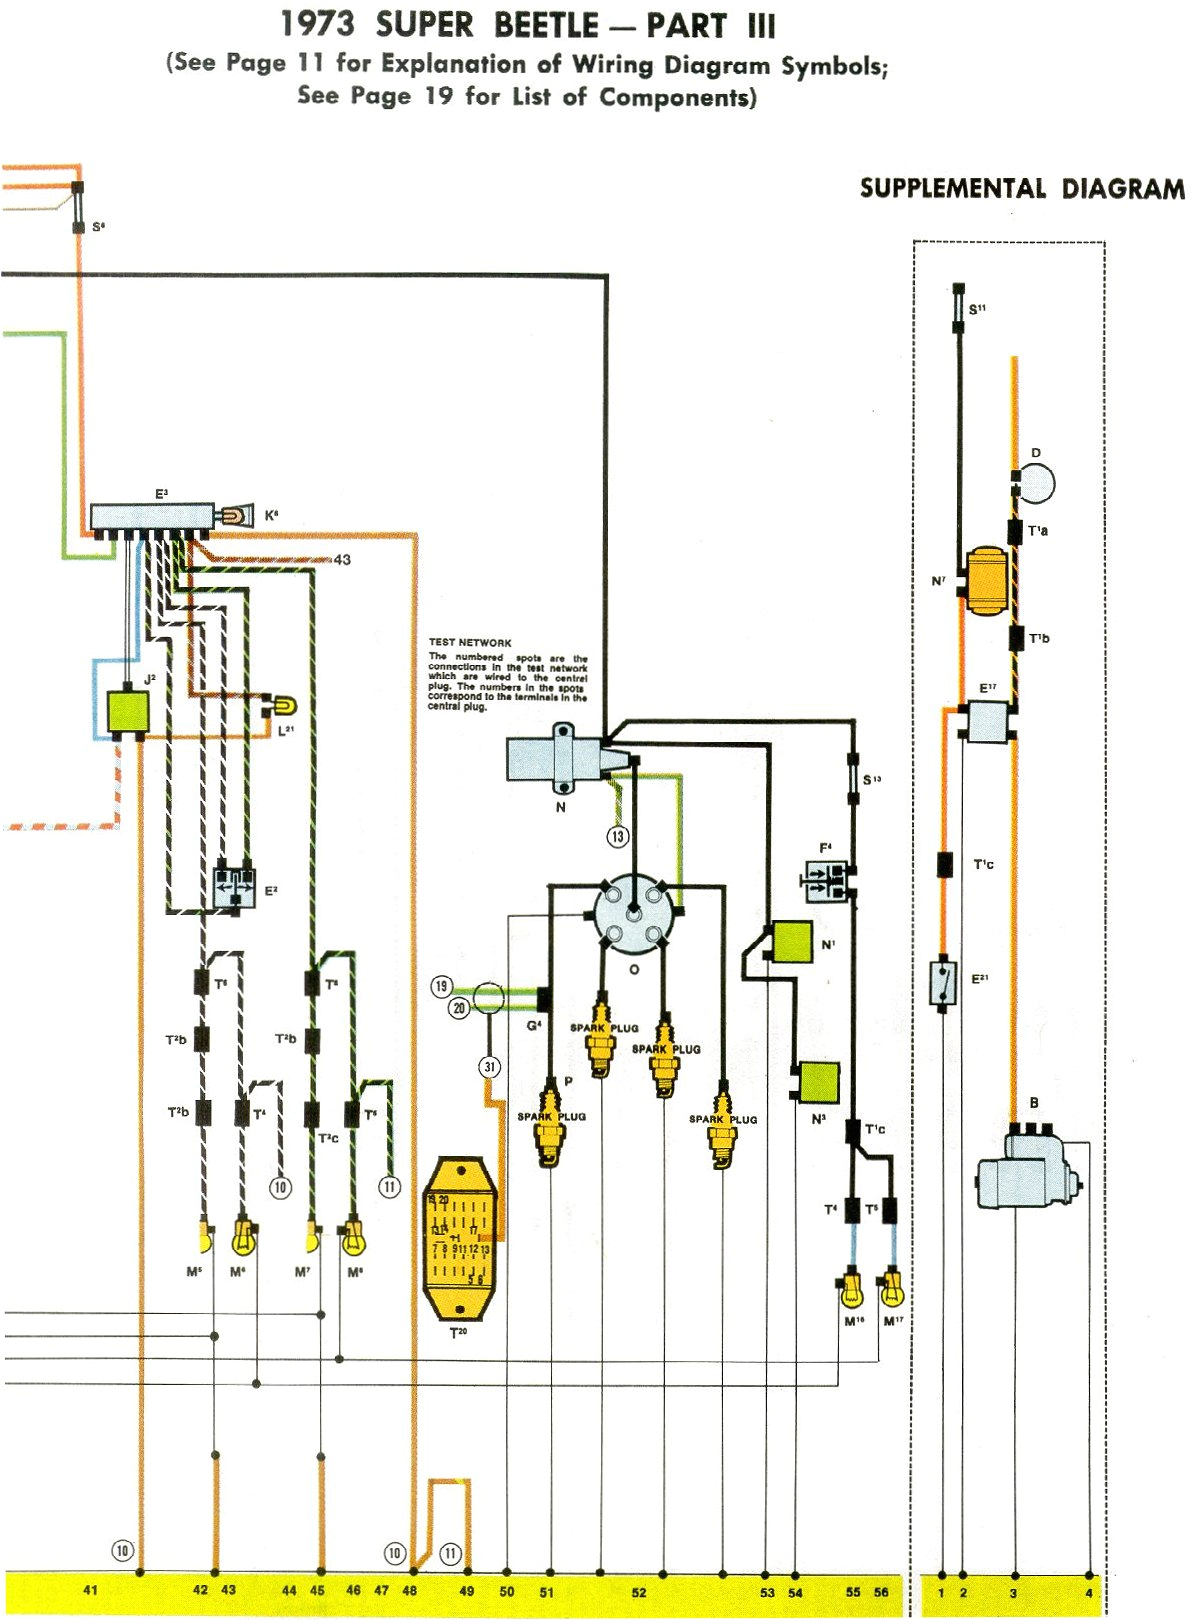 1973 super beetle wiring diagram thegoldenbug com 1973 volkswagen beetle wiring diagram 1973 super beetle wiring